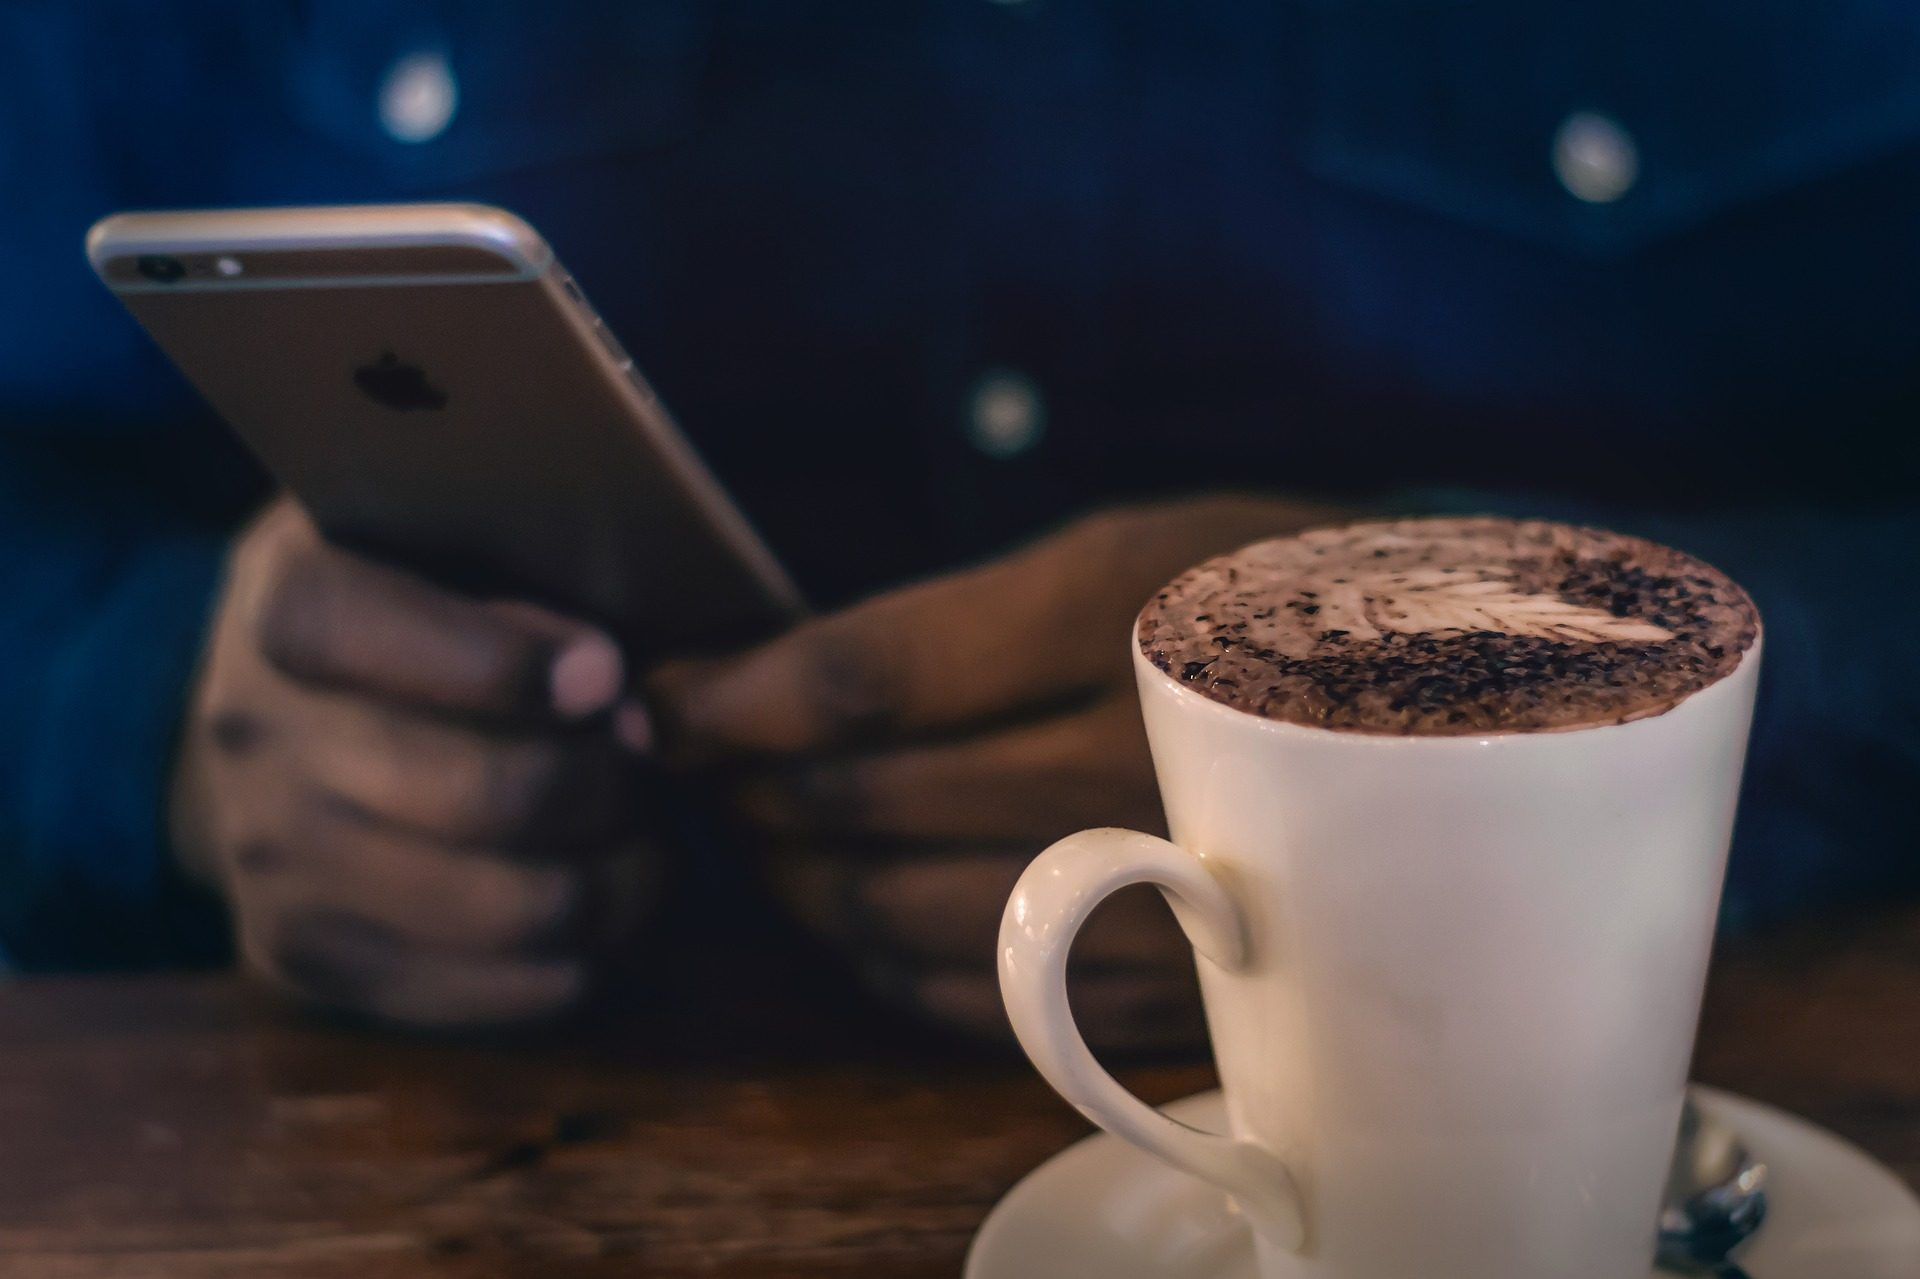 café, taza, capuccino, móvil, manos - Fondos de Pantalla HD - professor-falken.com